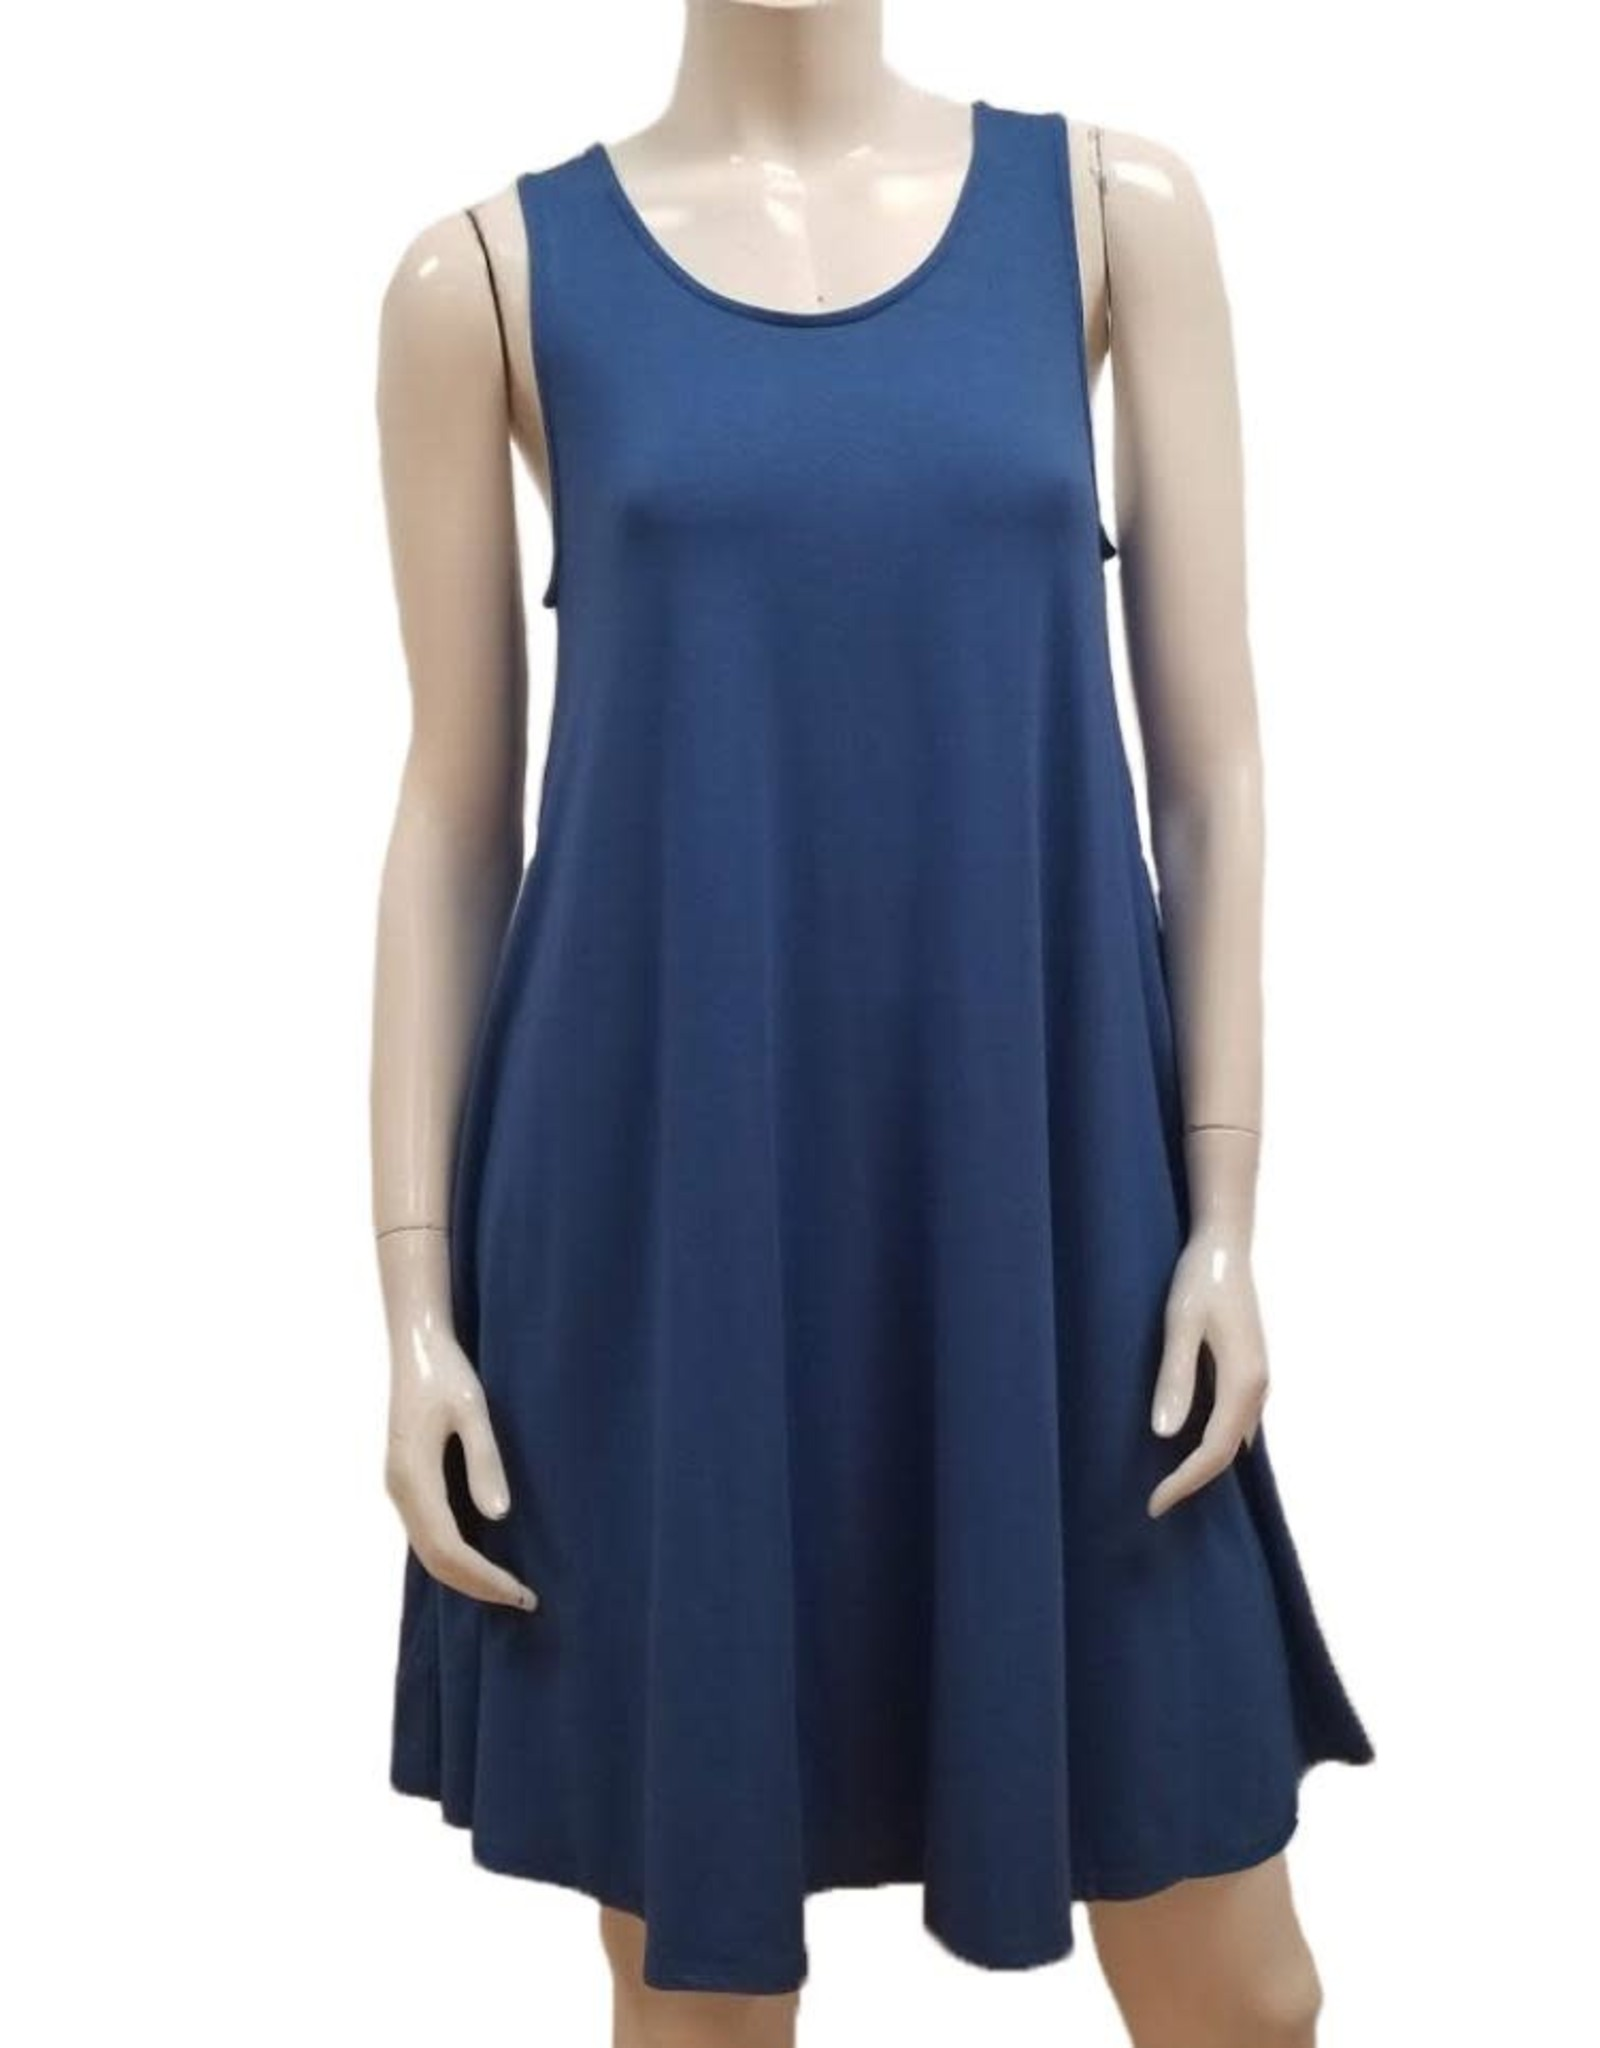 Gilmour BD-3002 Bamboo Pocket Swing Dress